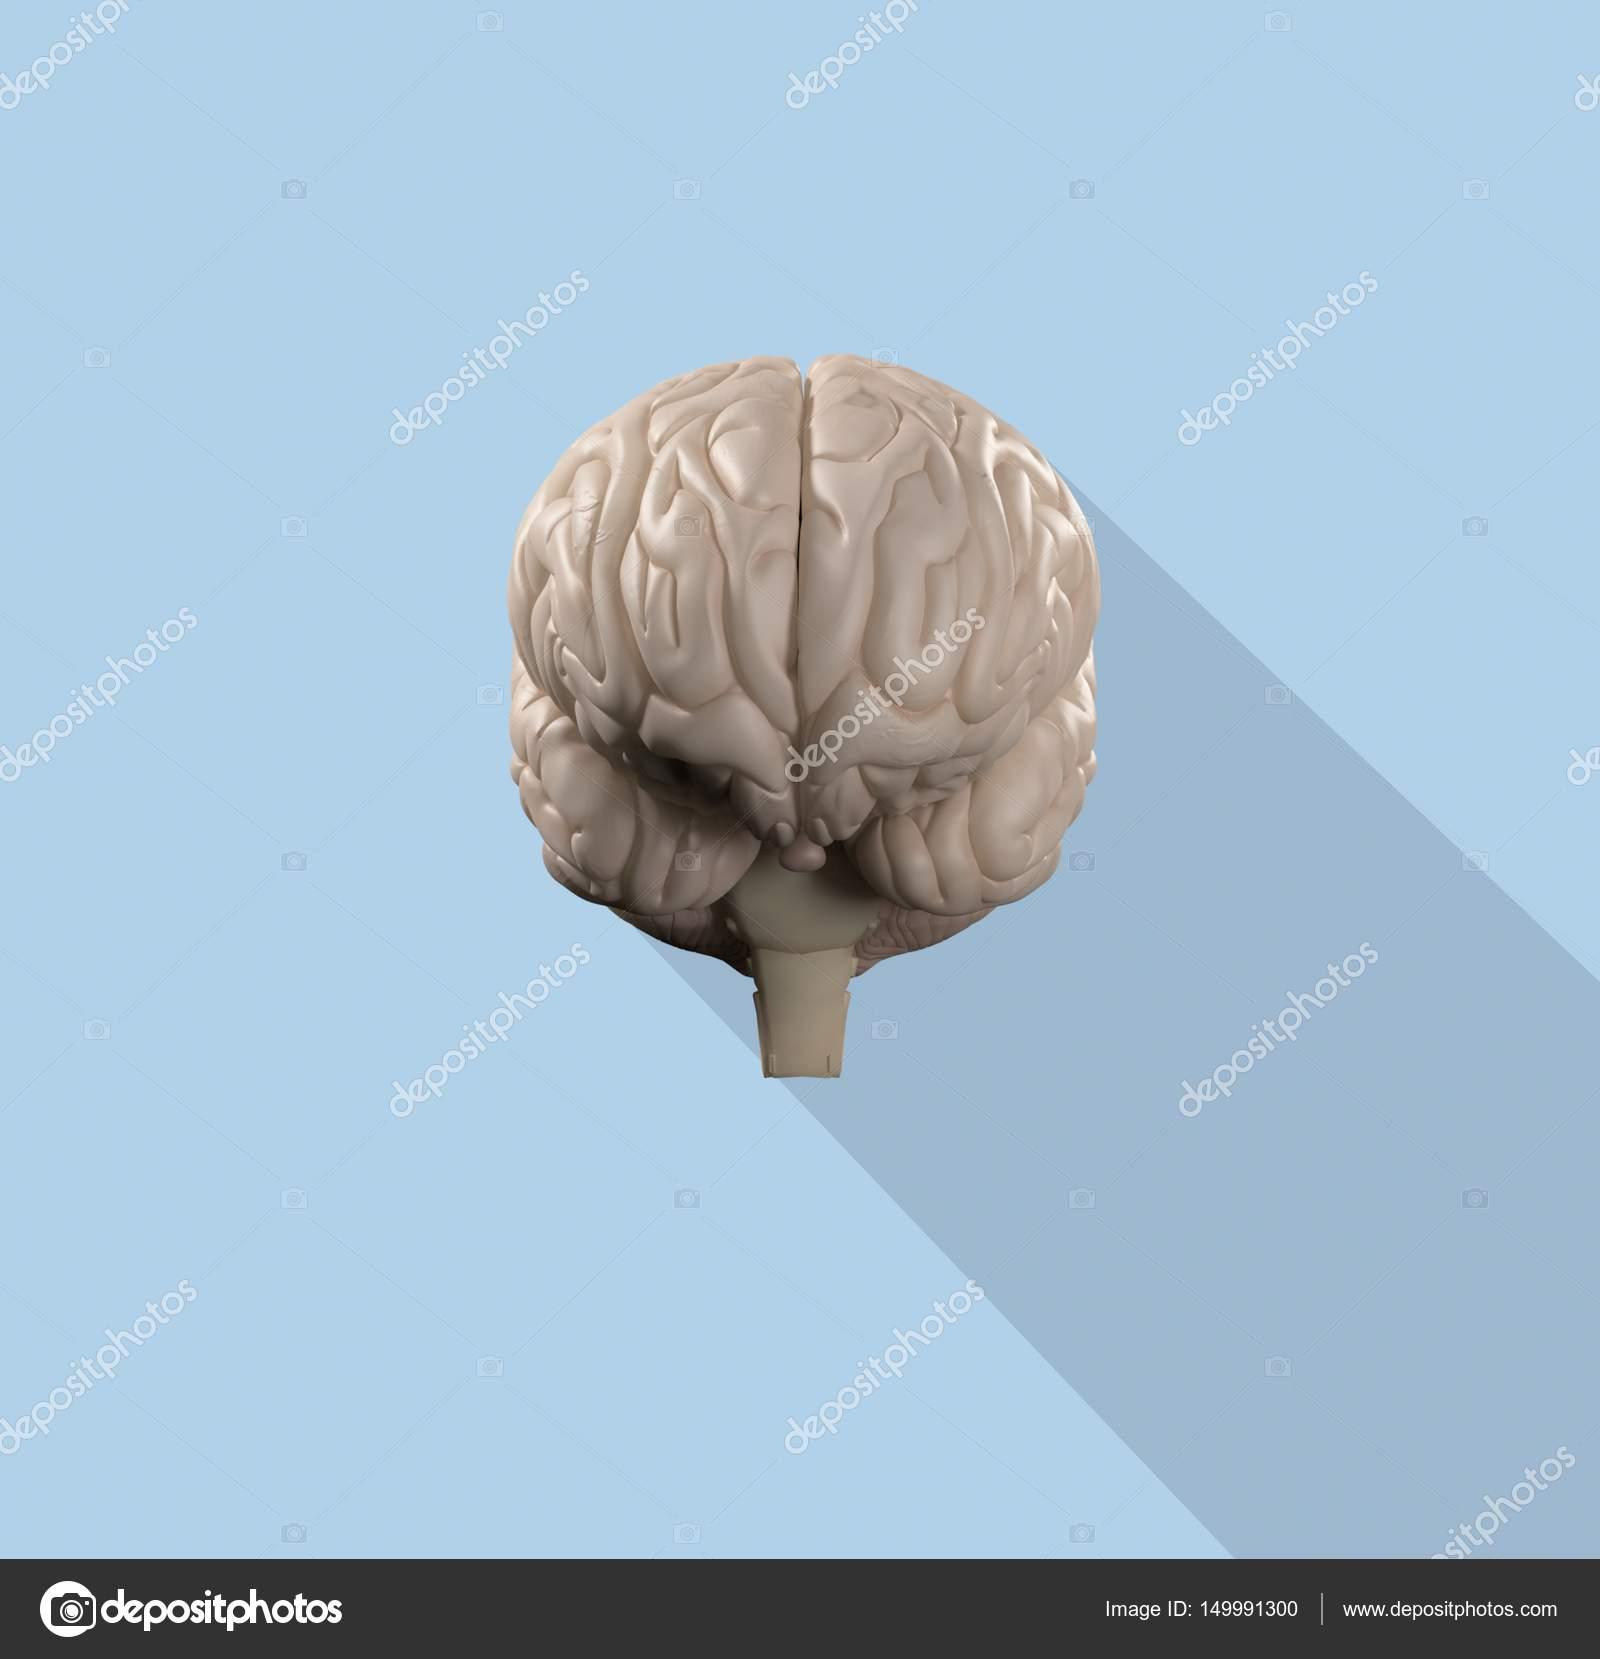 Human brain anatomy model icon — Stock Photo © AnatomyInsider #149991300